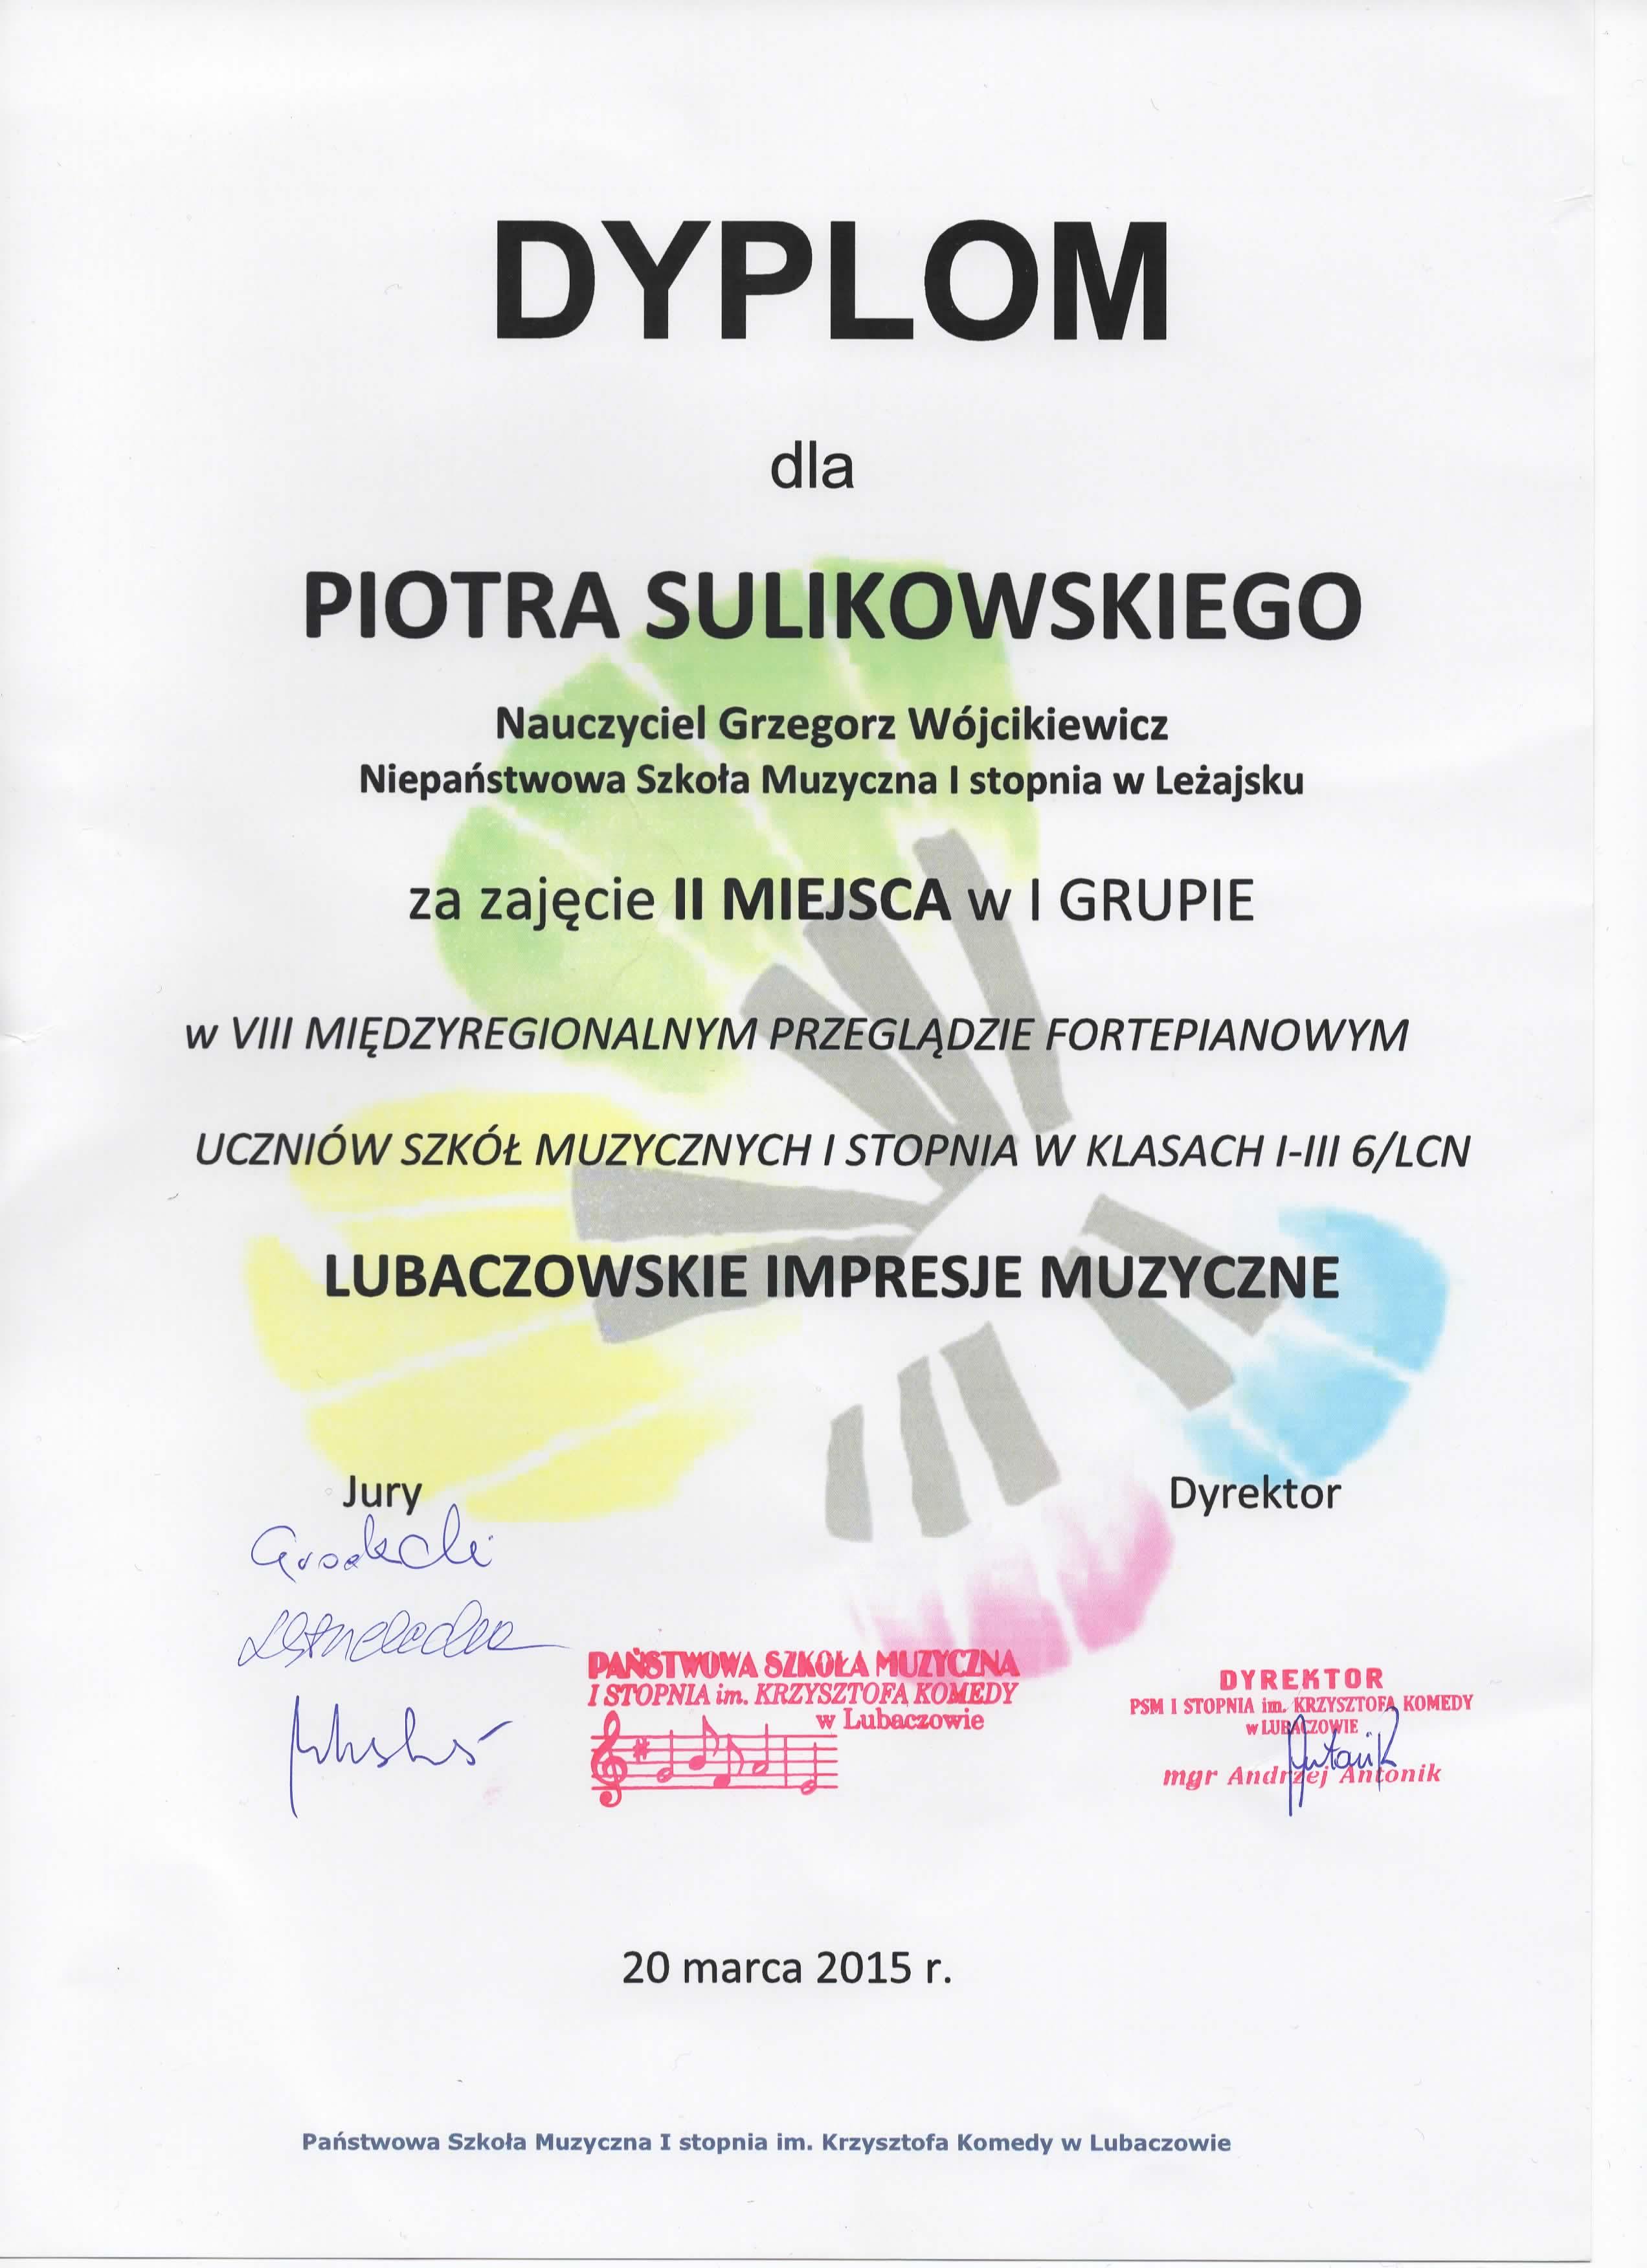 Piotr Sulikowski - 20.03.2015